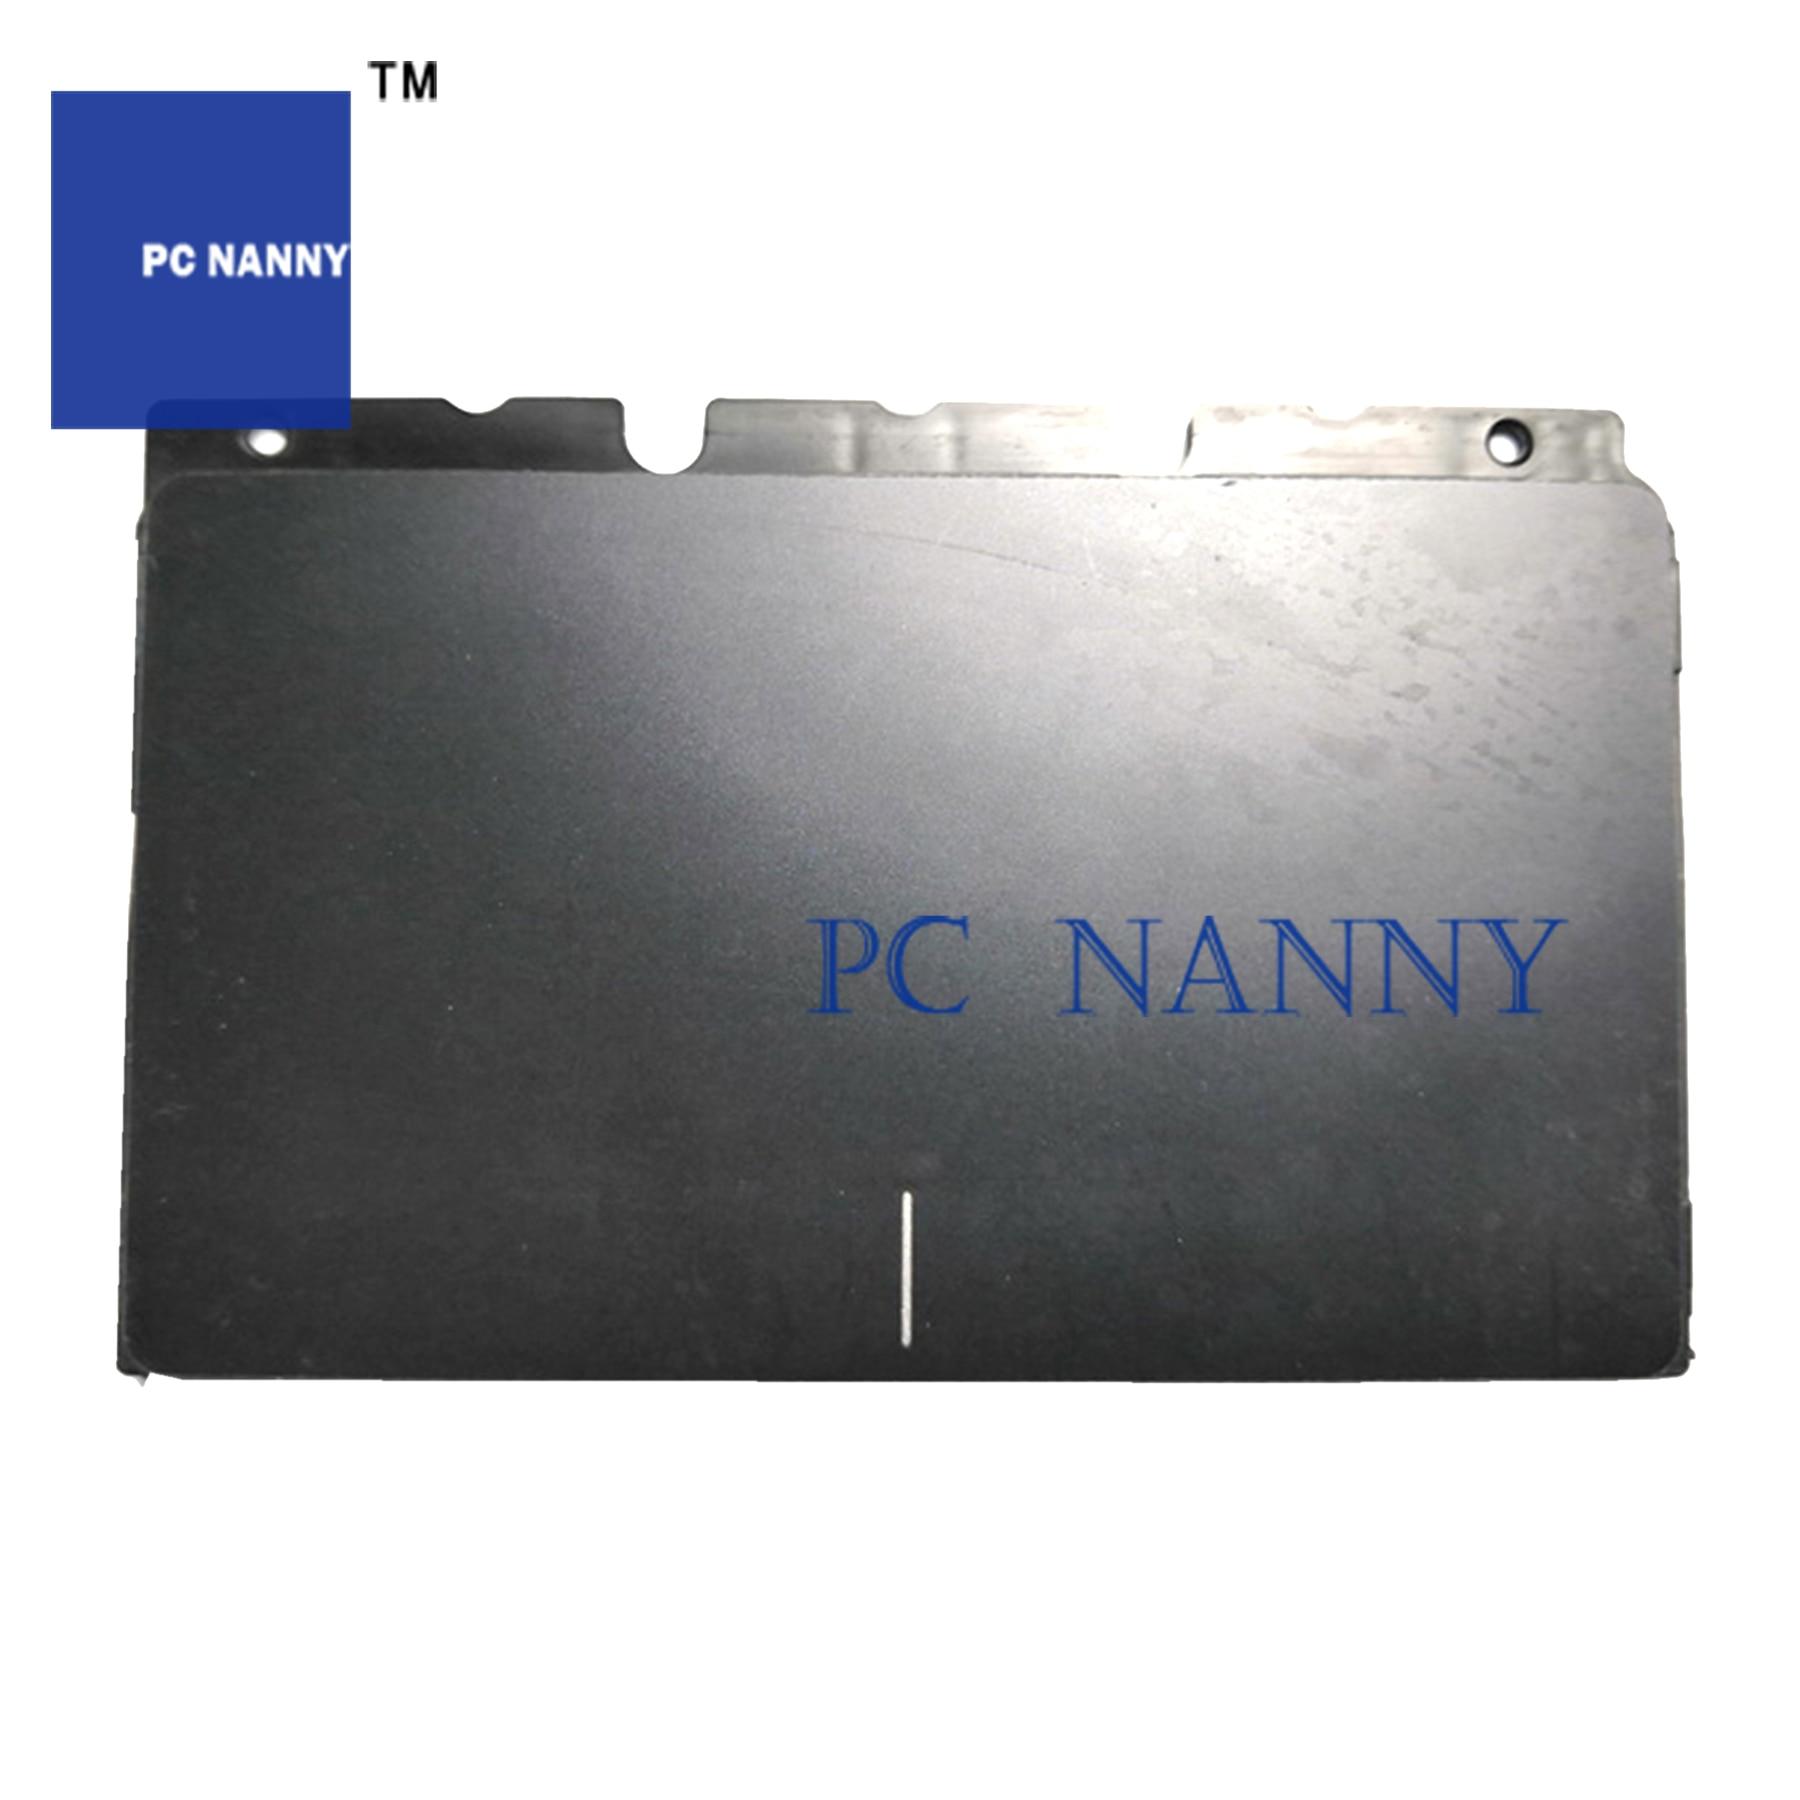 PCNANNY para Asus X401 X401U X401A touchpad prueba buena